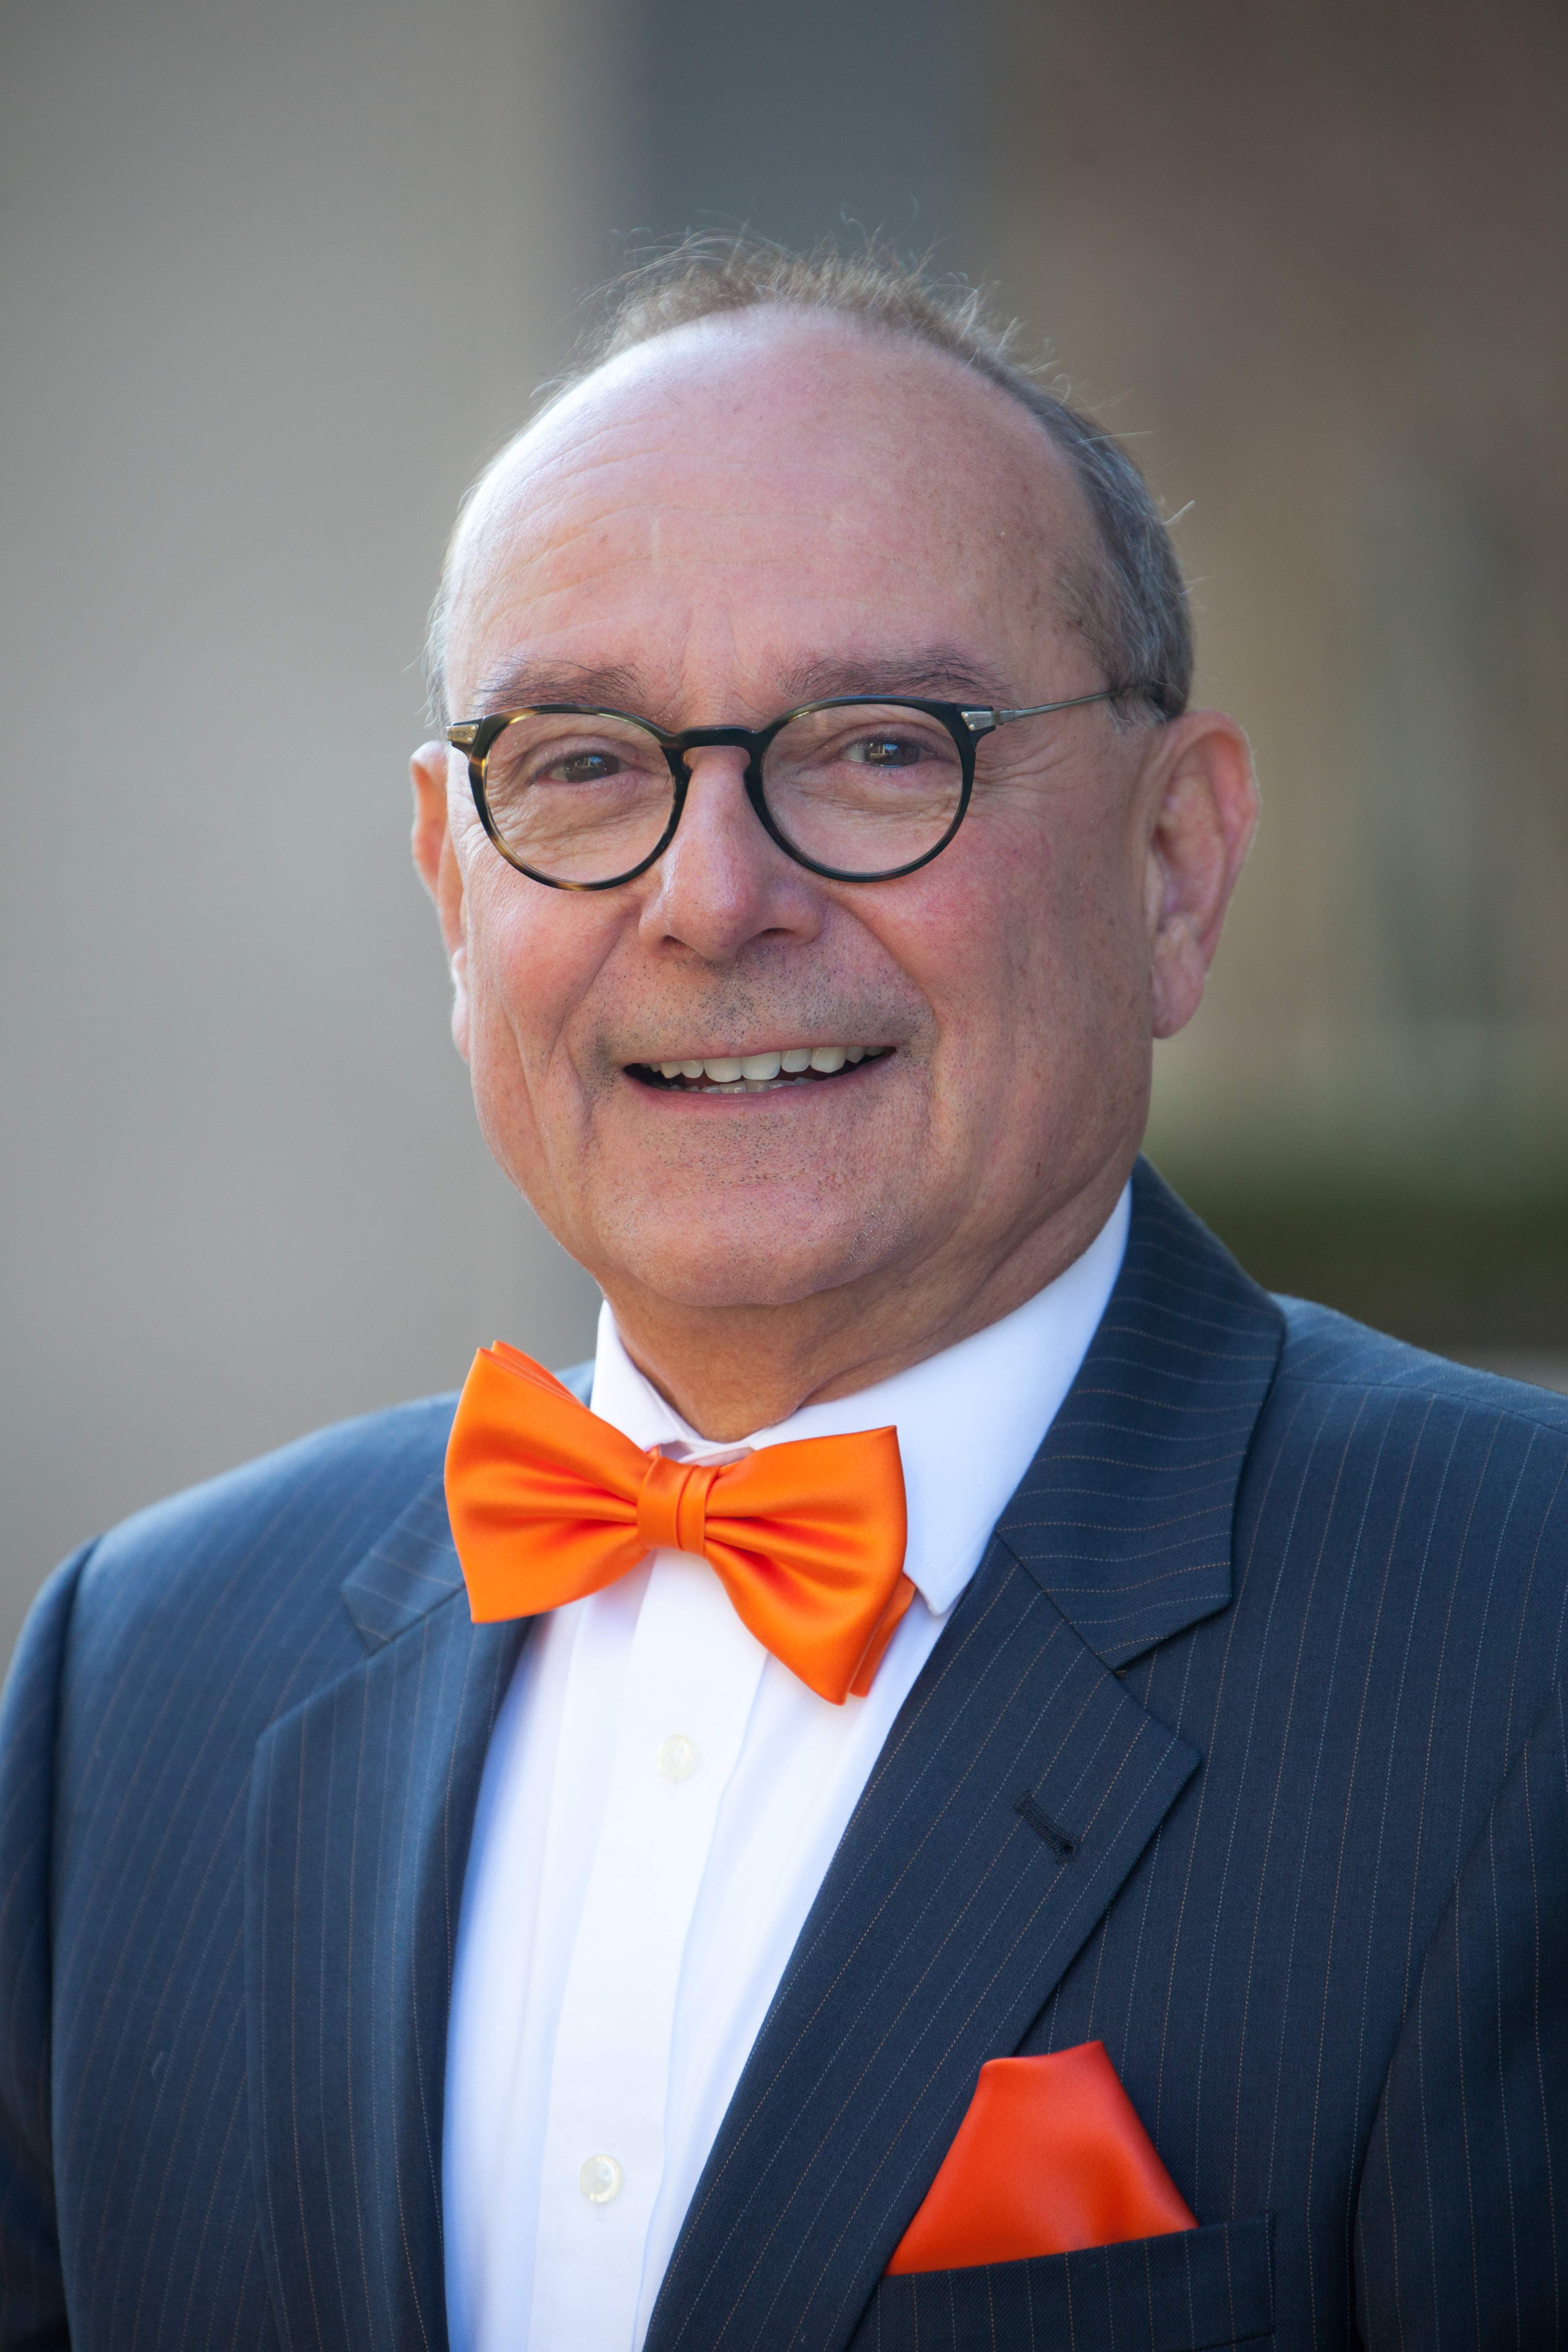 Fred Bohlander headshot